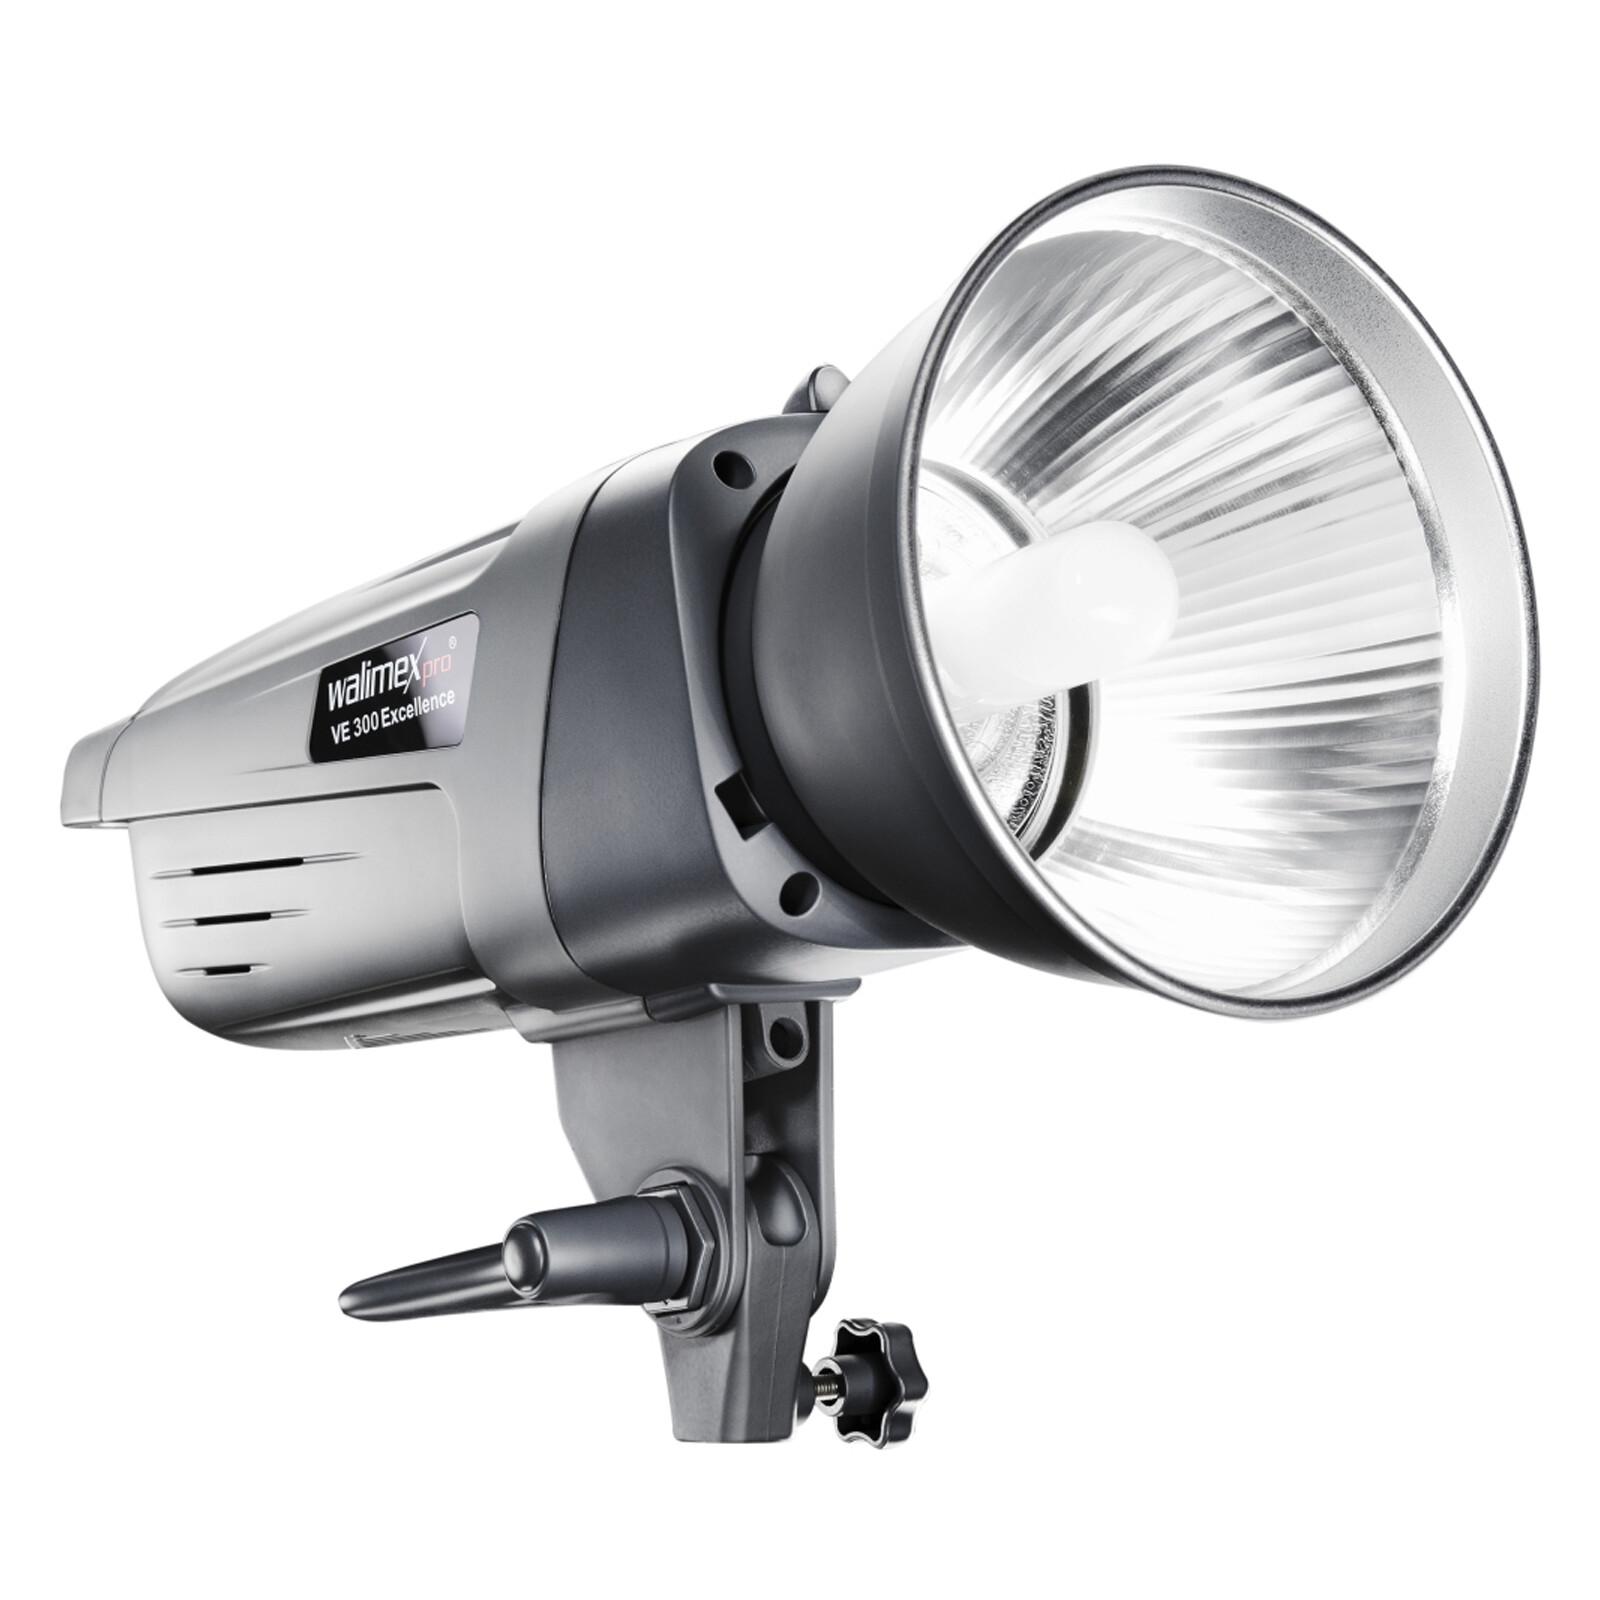 Walimex Pro VE-300 Excellence Studioblitzleuchte